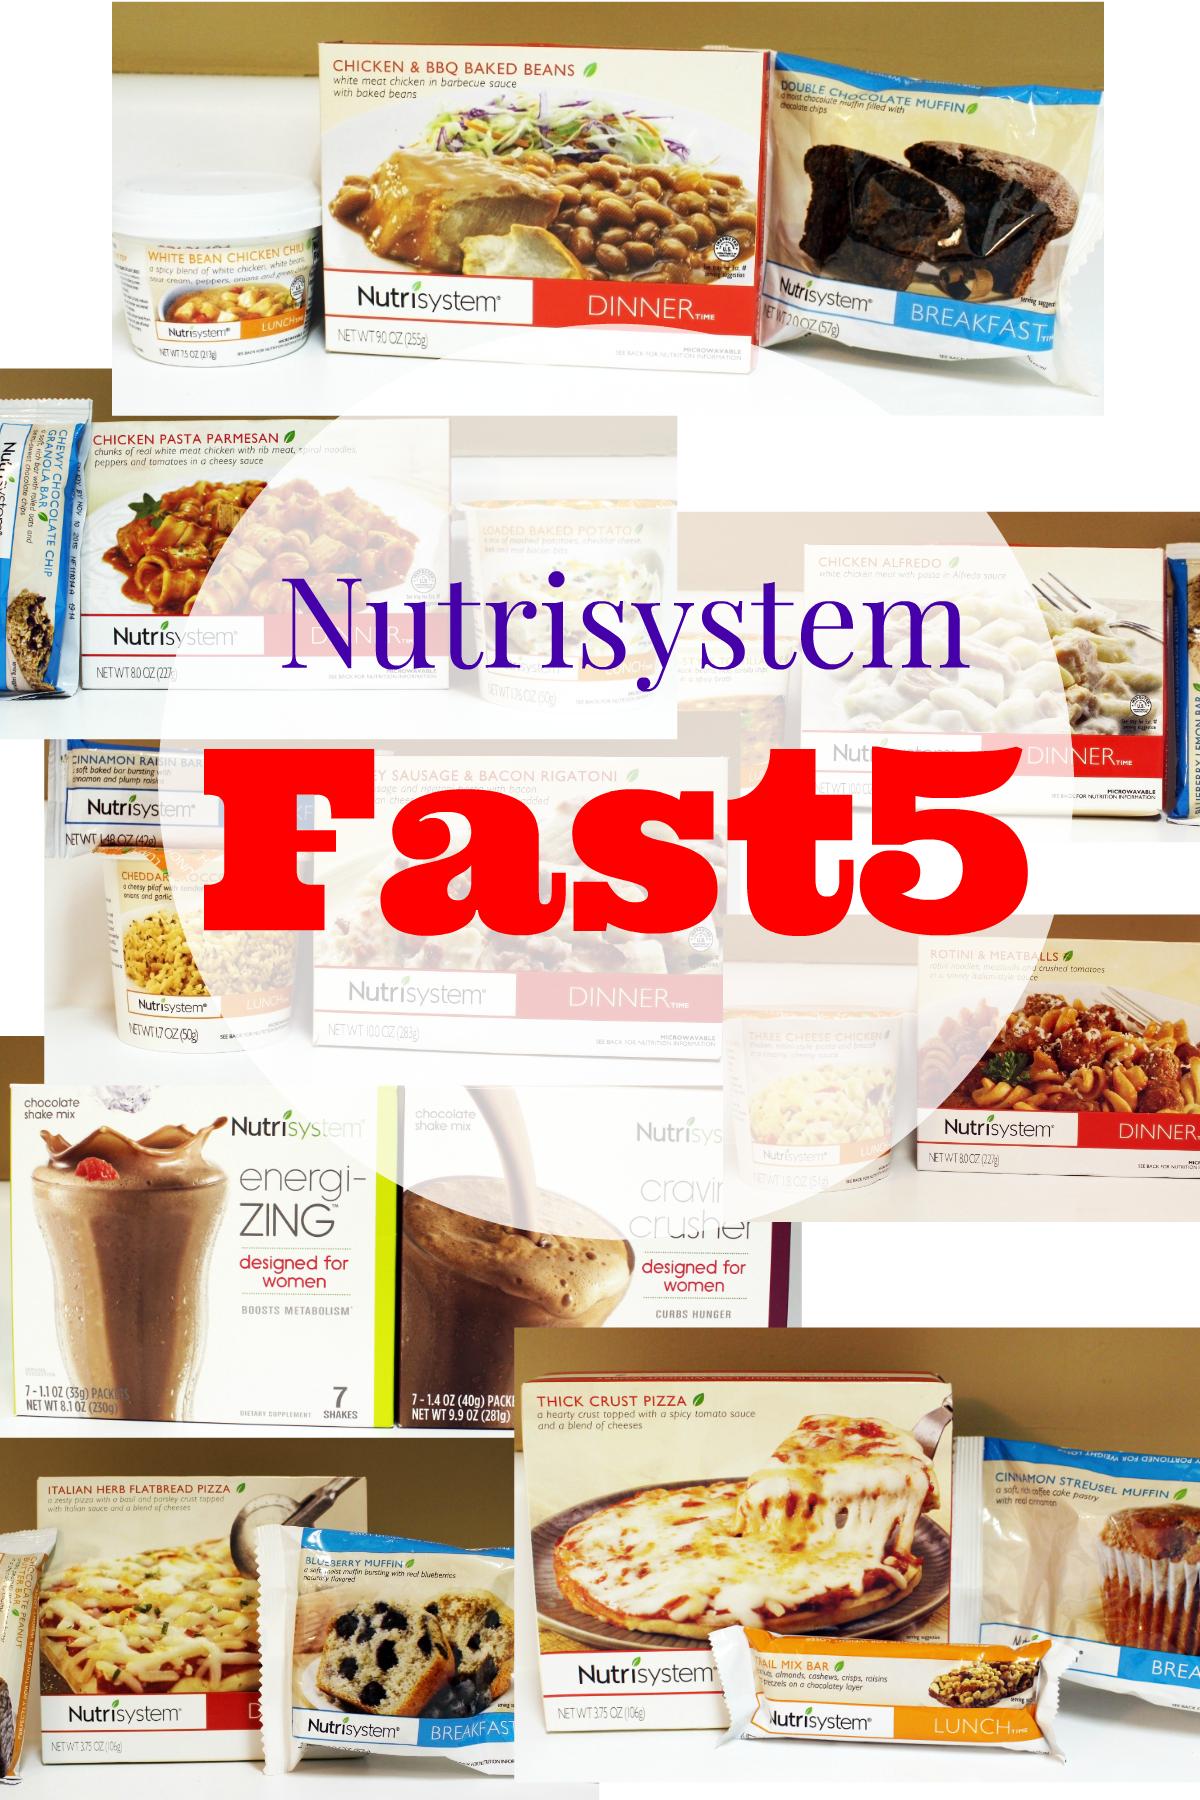 Week In Review on the Nutrisytem Fast 5 Program